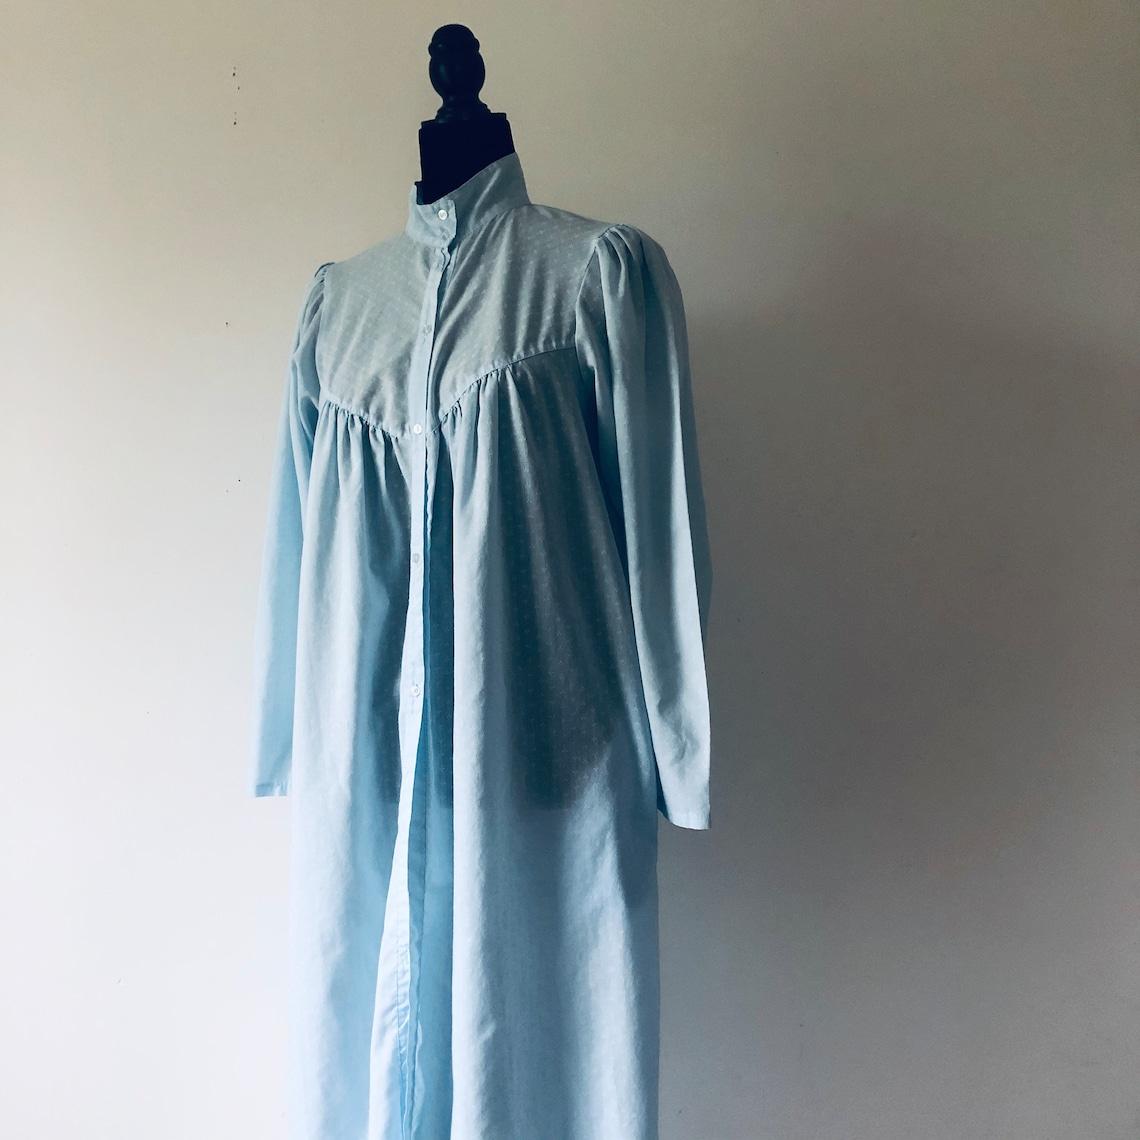 Leg o mutton sleeve blue see through button front robe dress